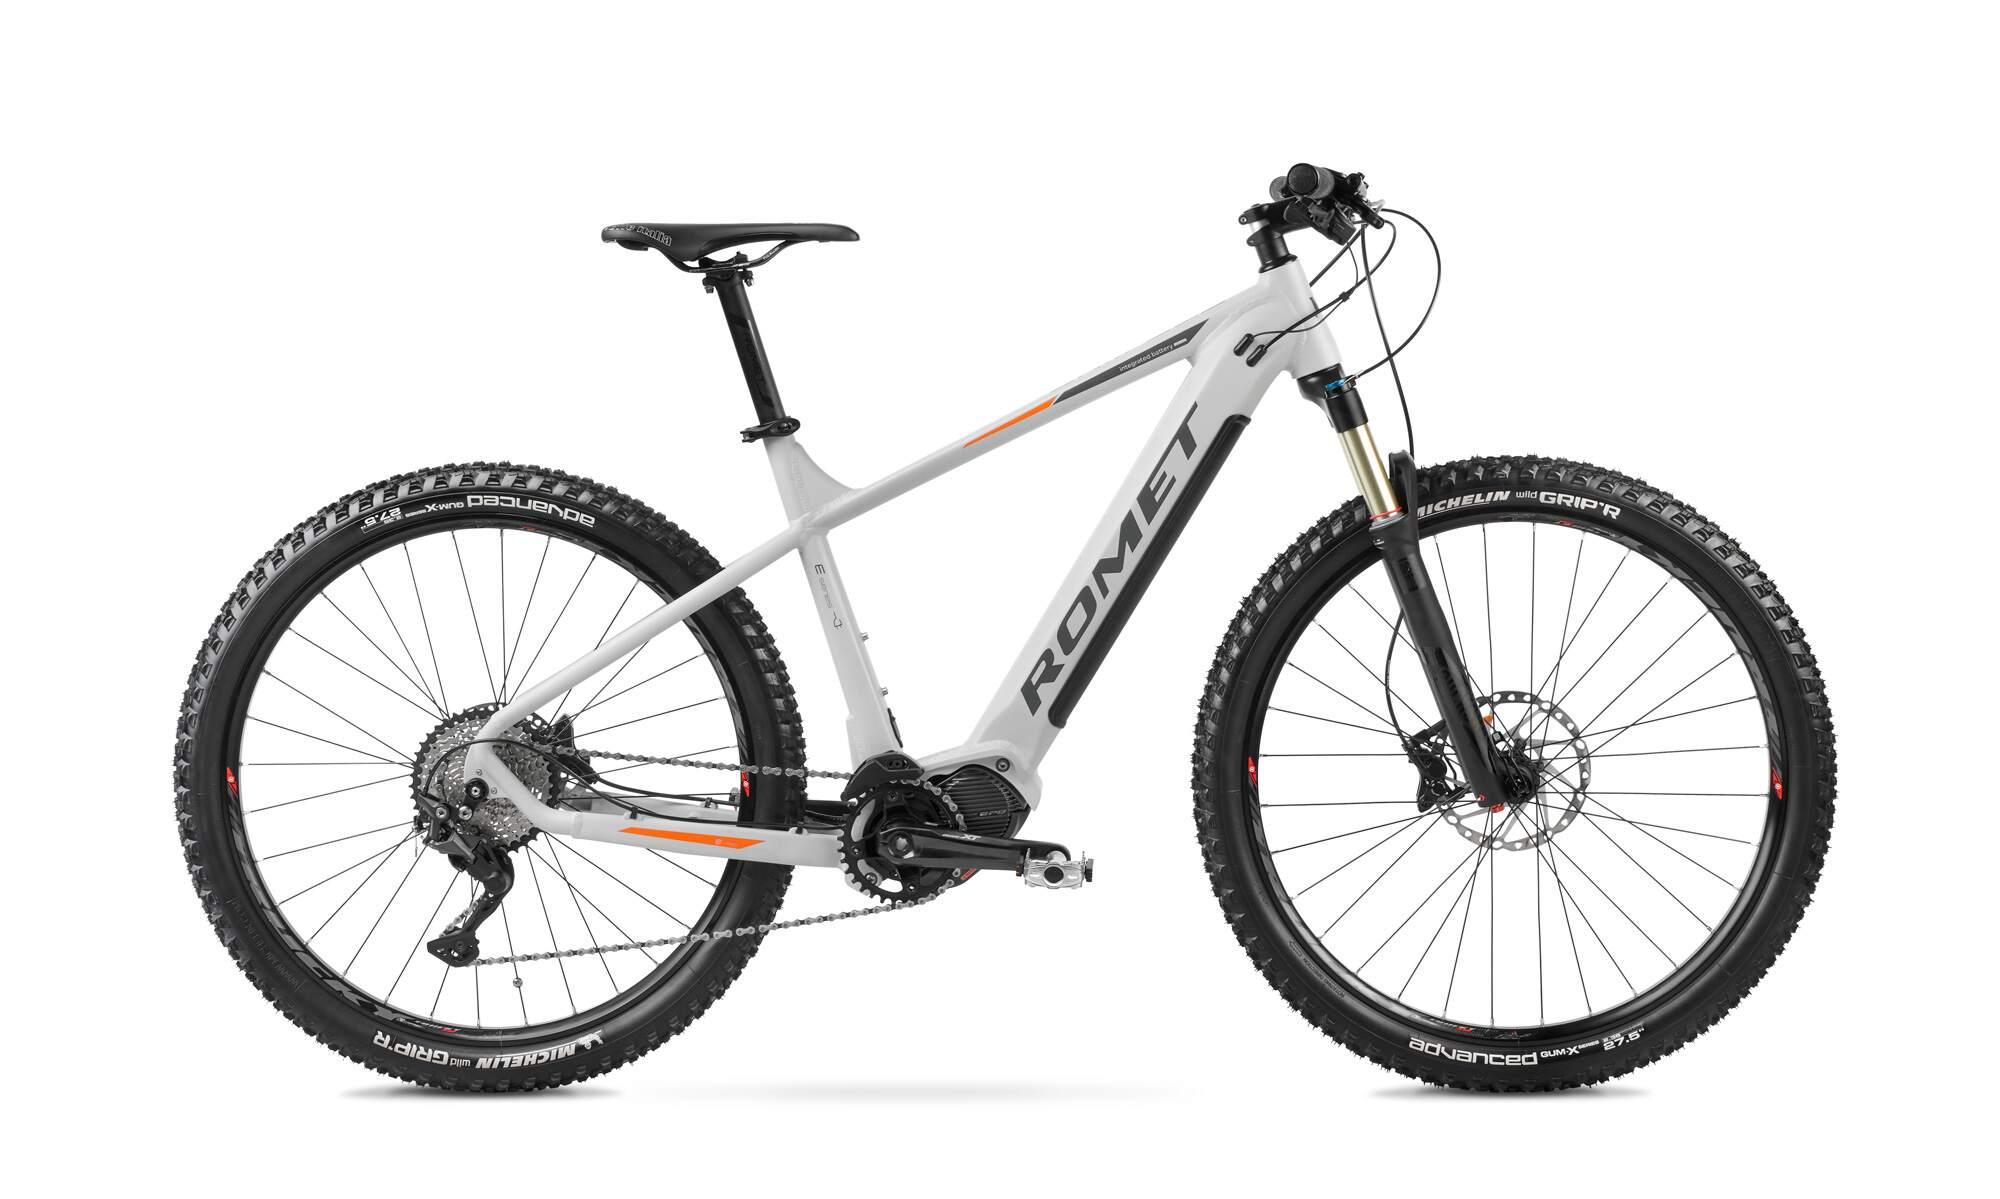 E mountainbike Mittelmotor 27,5 Zoll Romet ERM205 19Inch Weiss